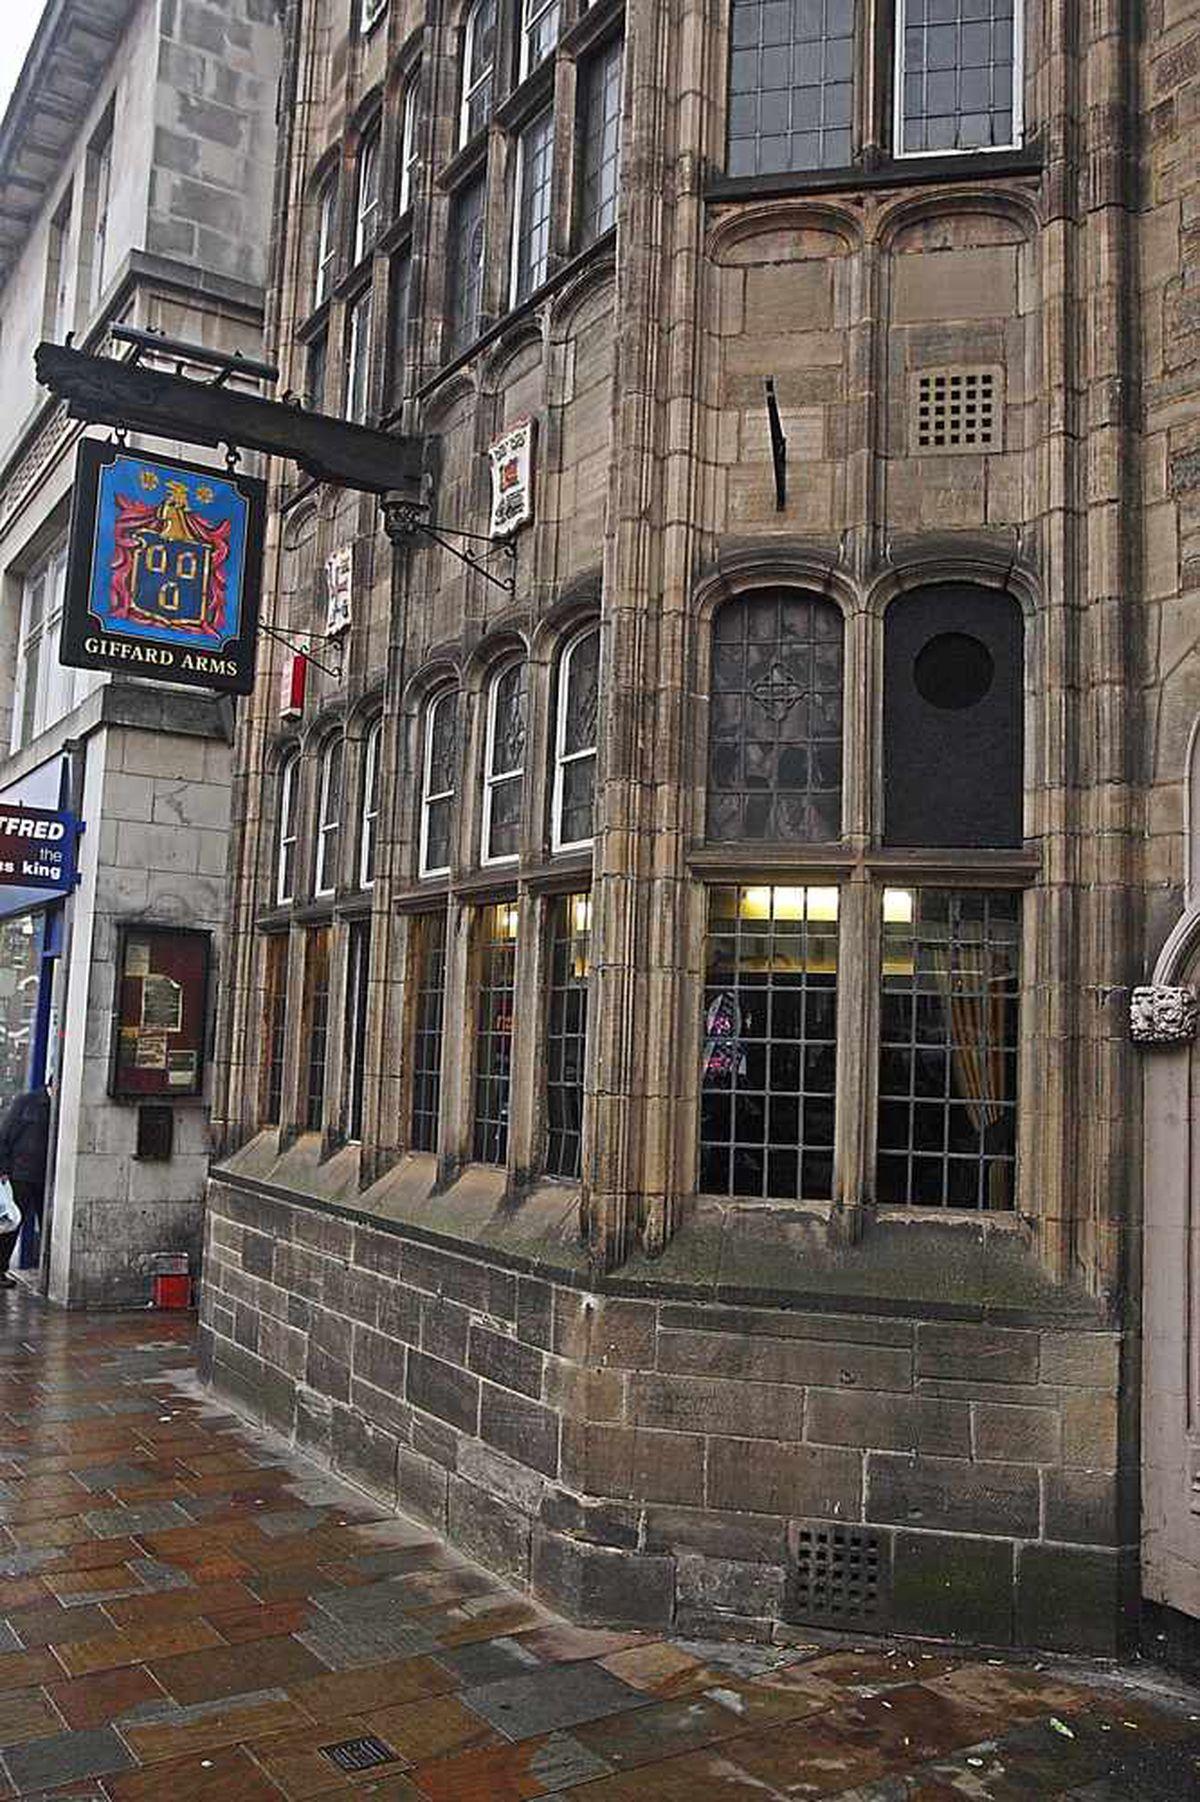 Giffard Arms, Victoria Street, Wolverhampton